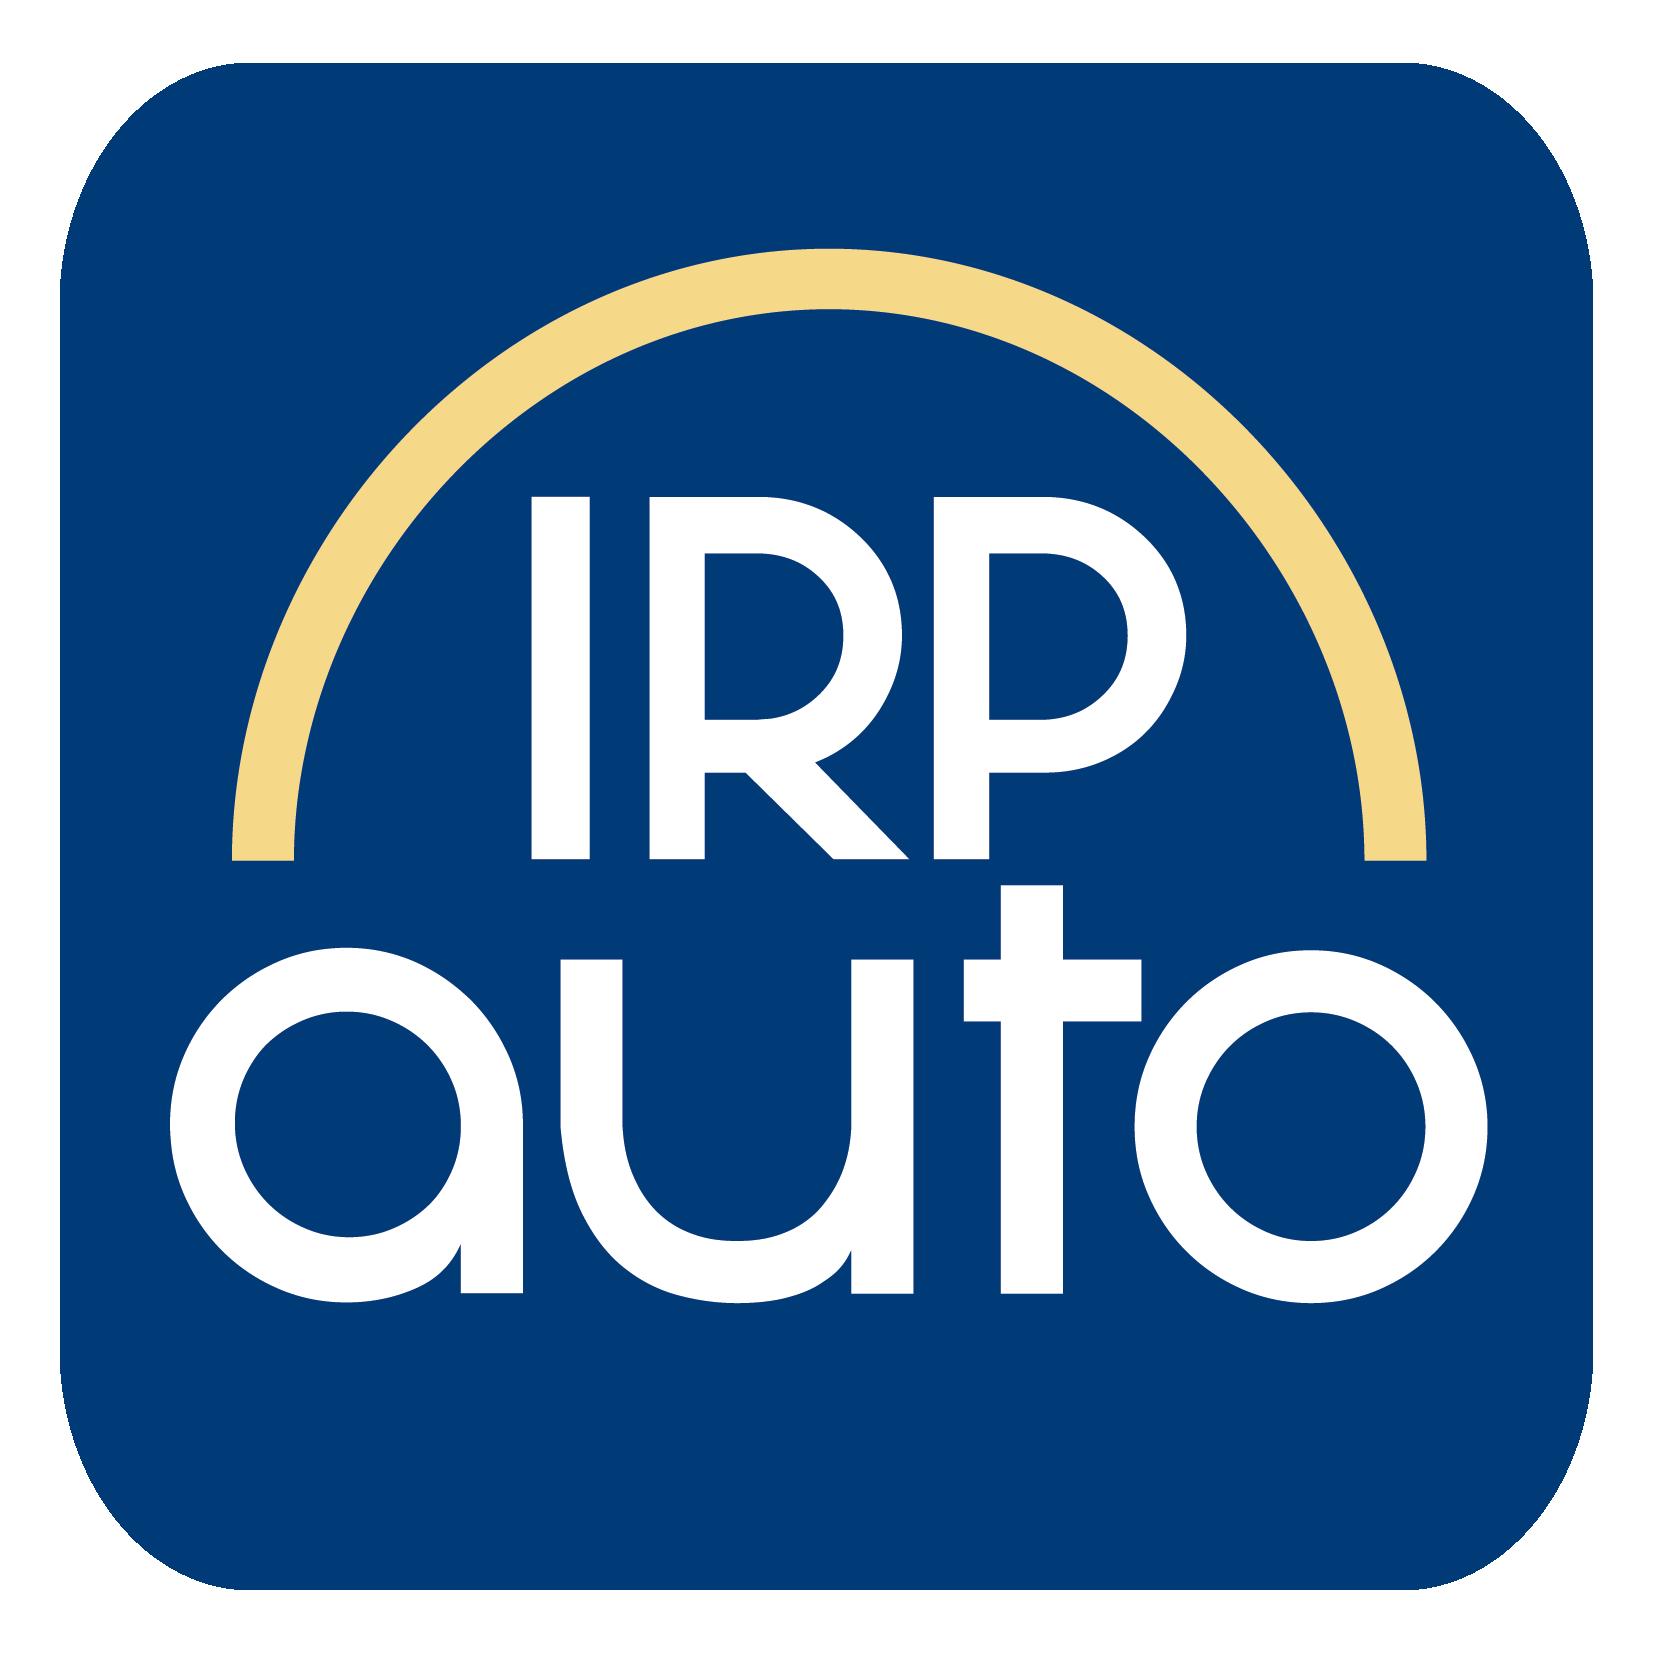 Le groupe IRP AUTO